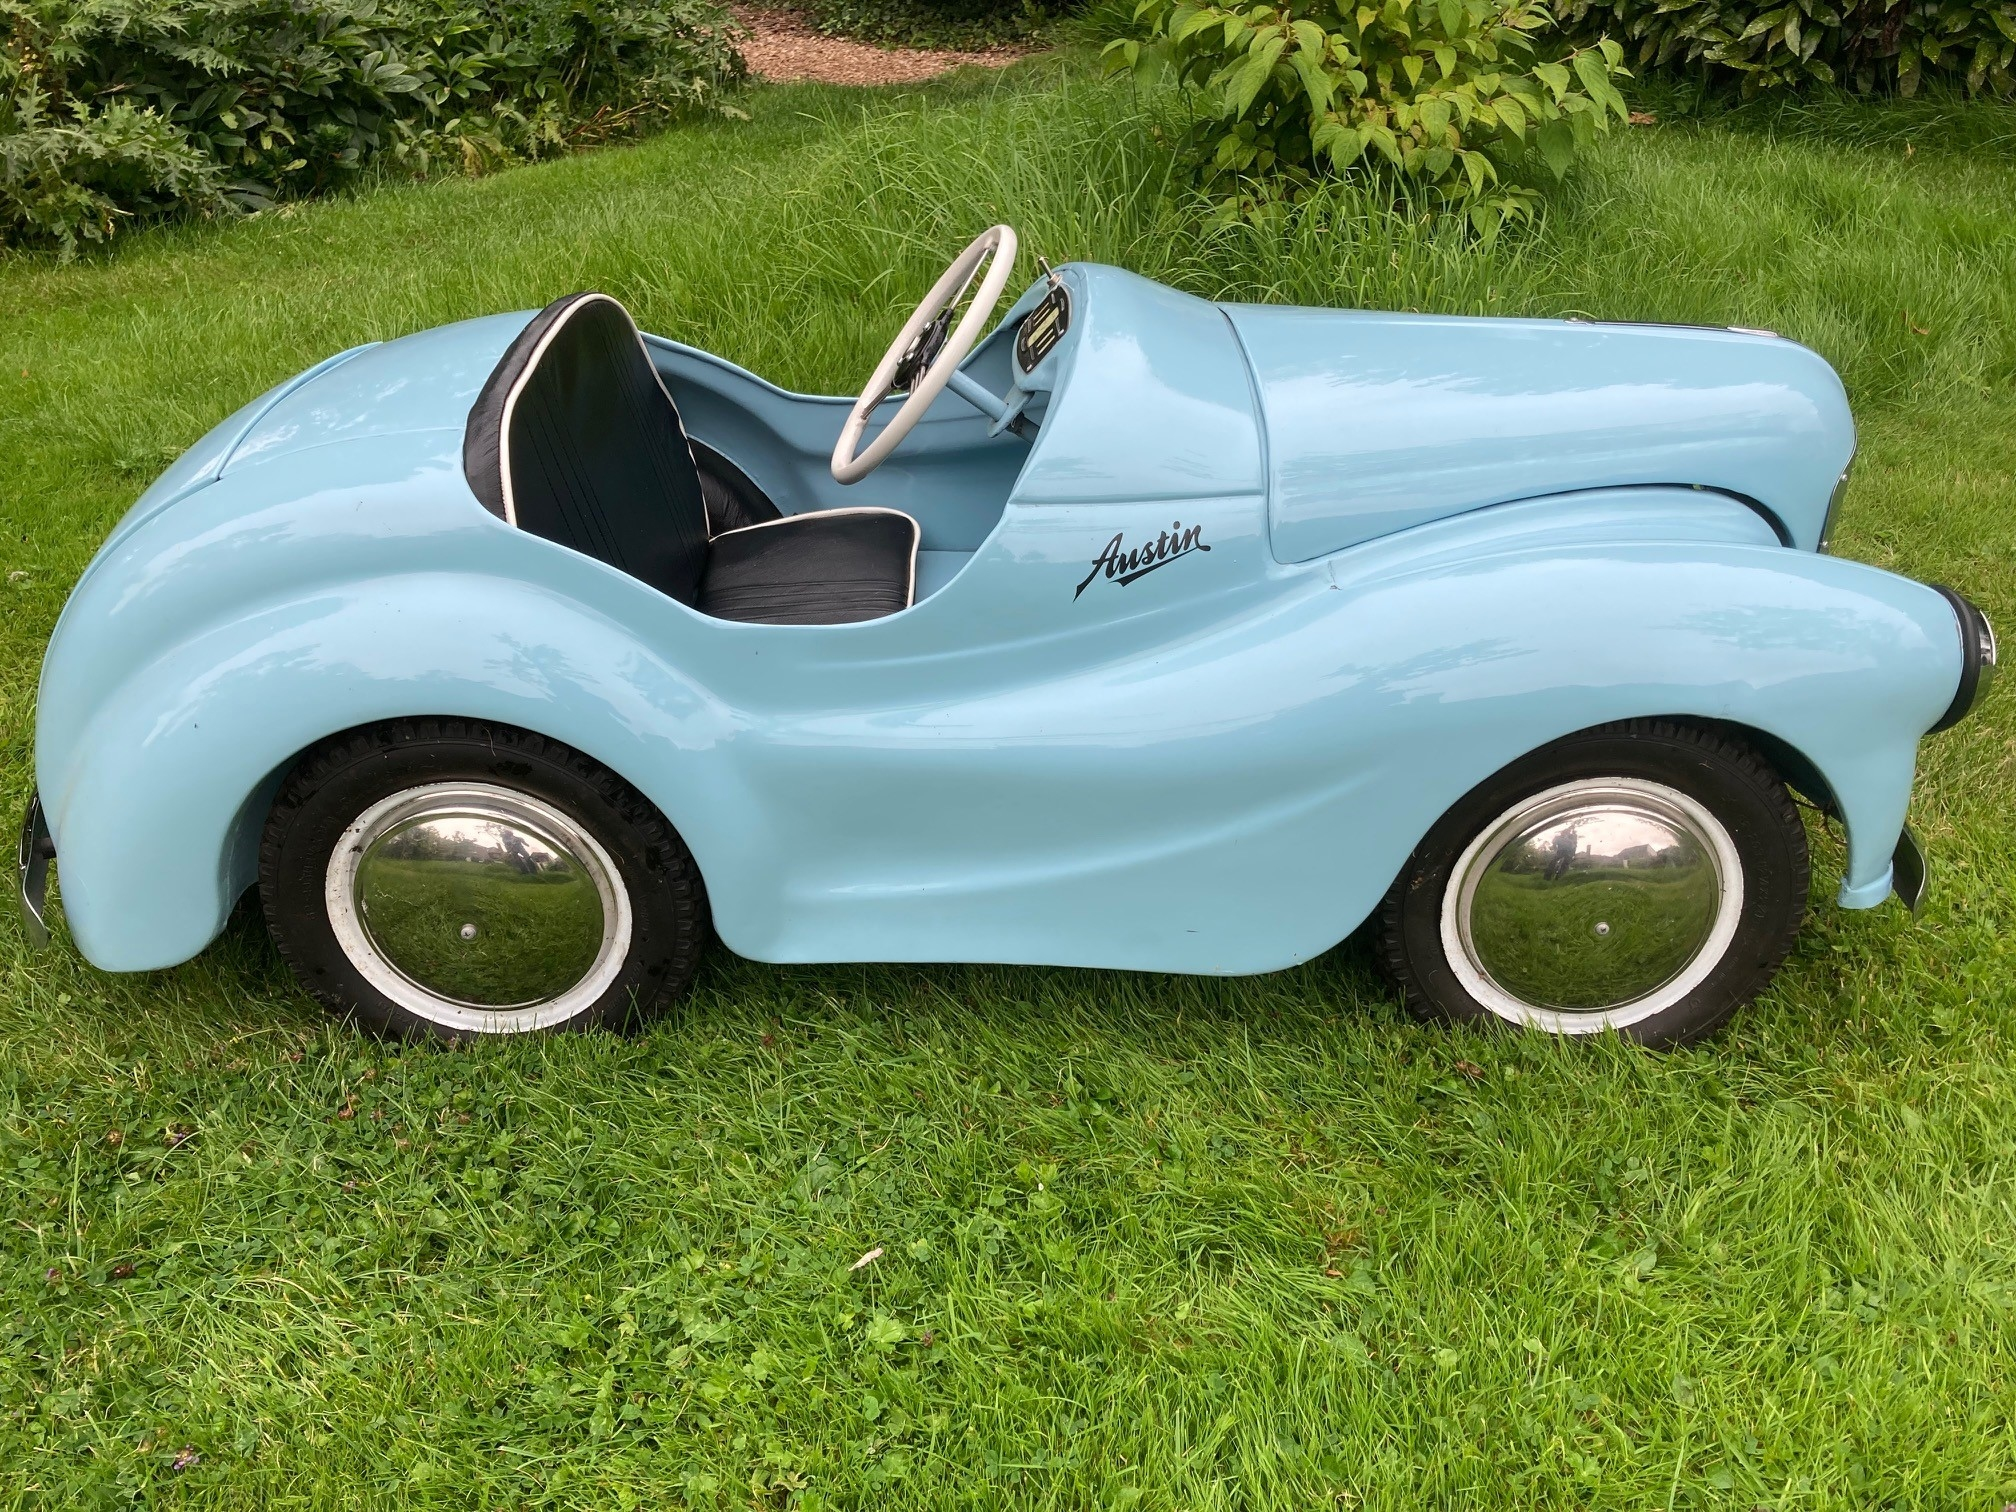 An Austin J40 Pedal Car, British, mid 1950s,